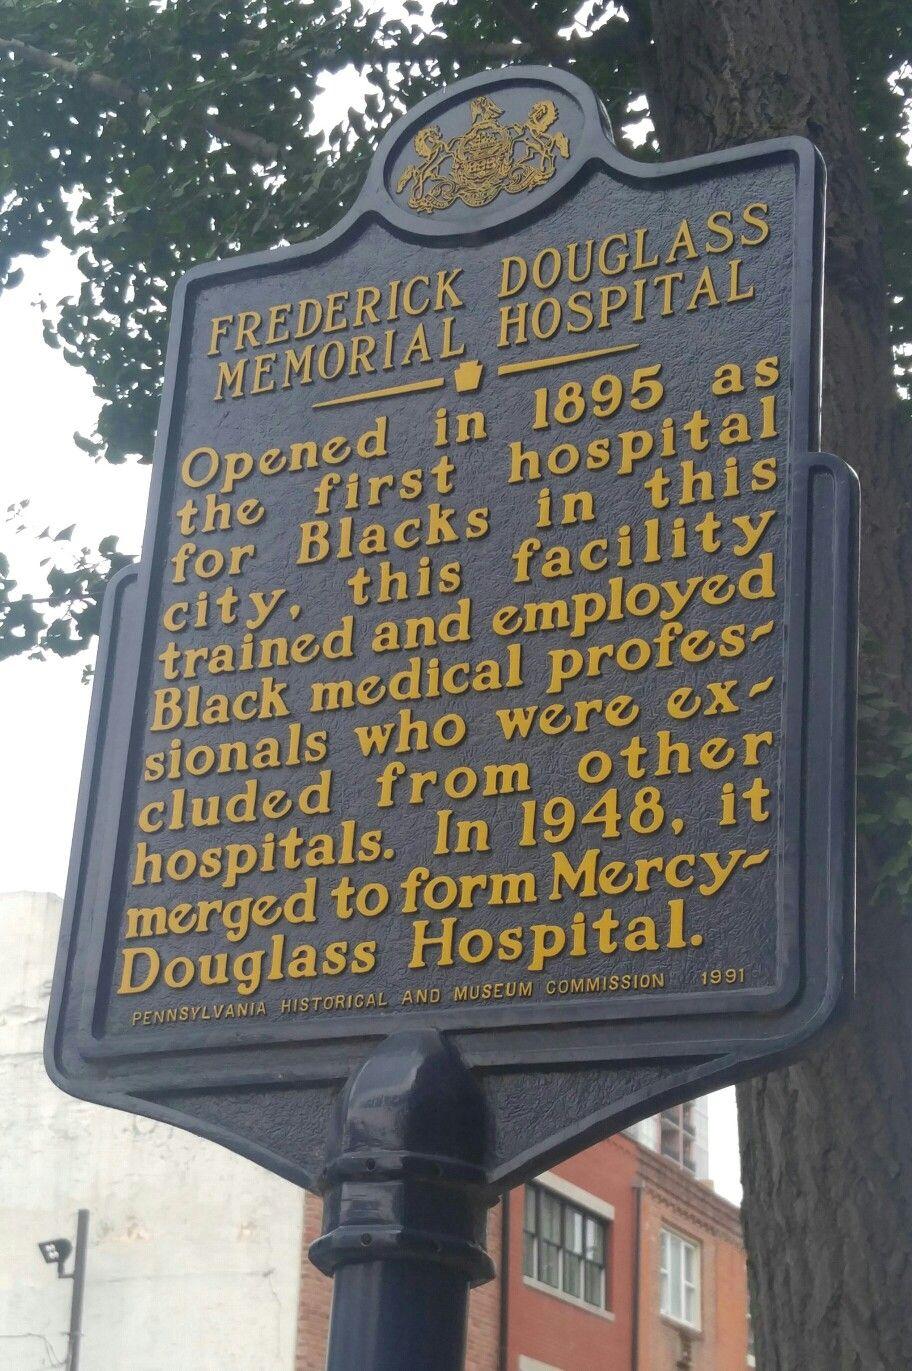 Frederick douglass memorial hospital this marker is